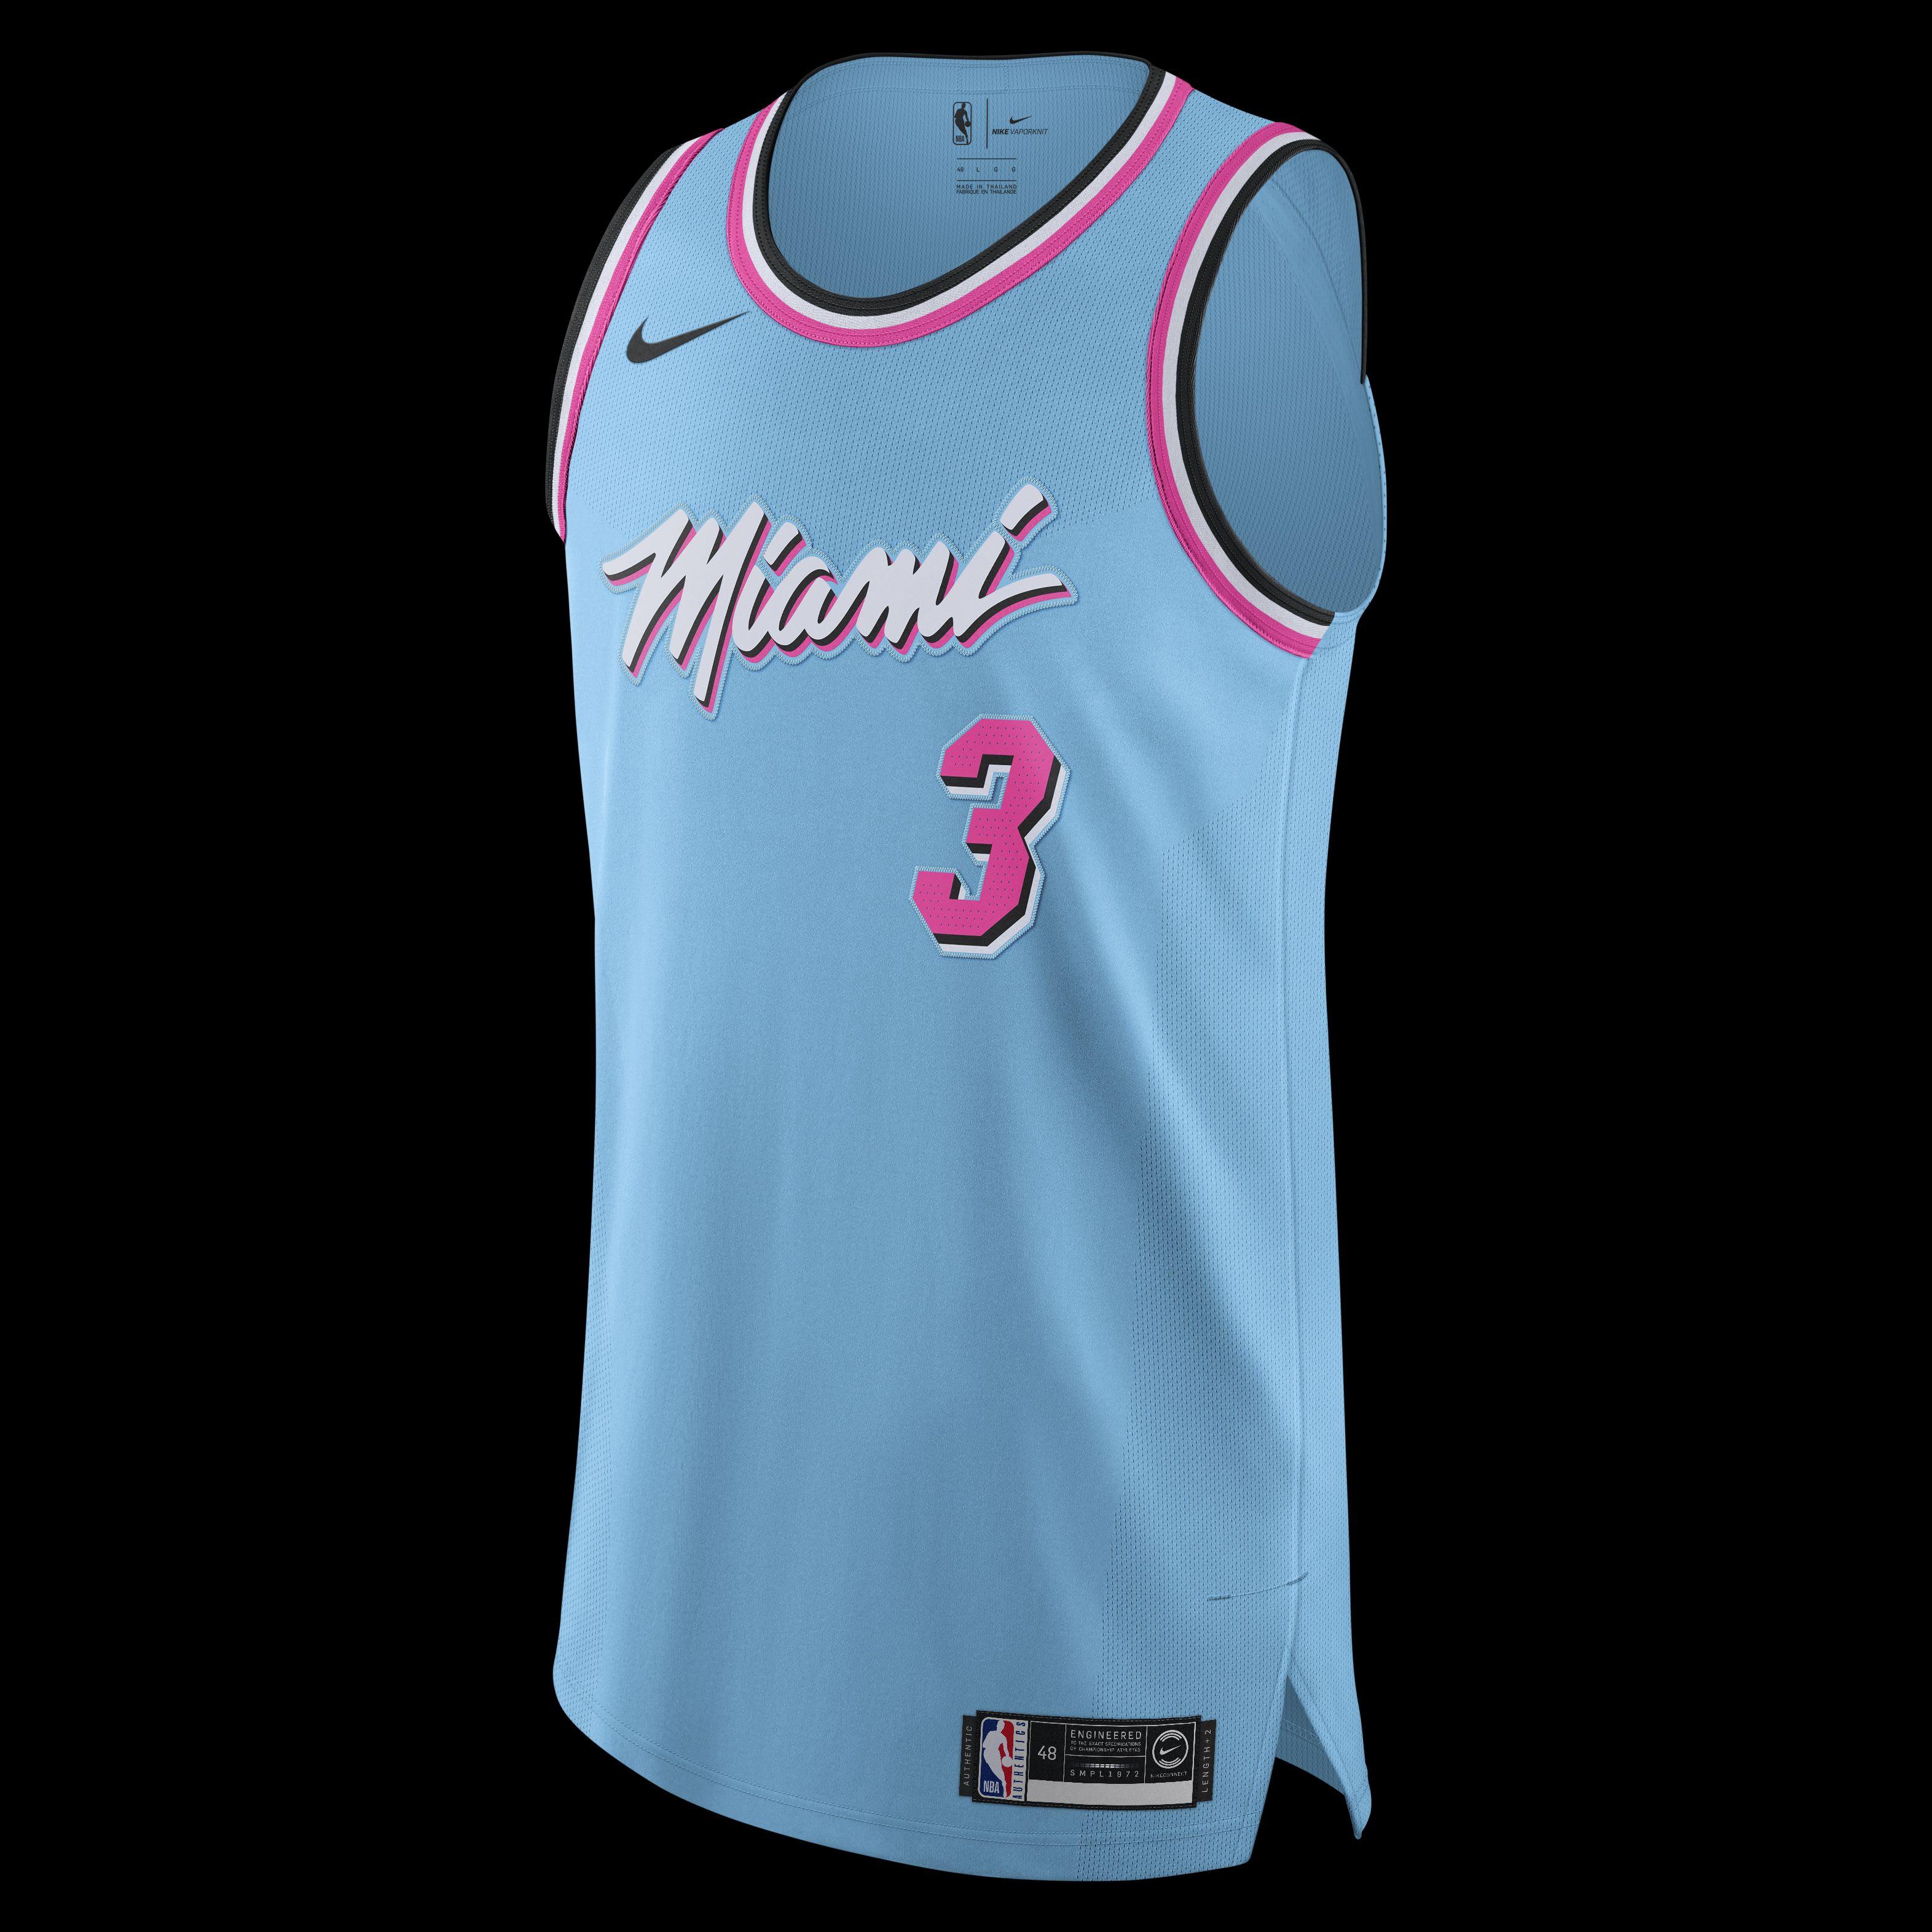 Sandalias Inconsistente mineral  Get your Miami Heat City Edition Jerseys now at Fanatics